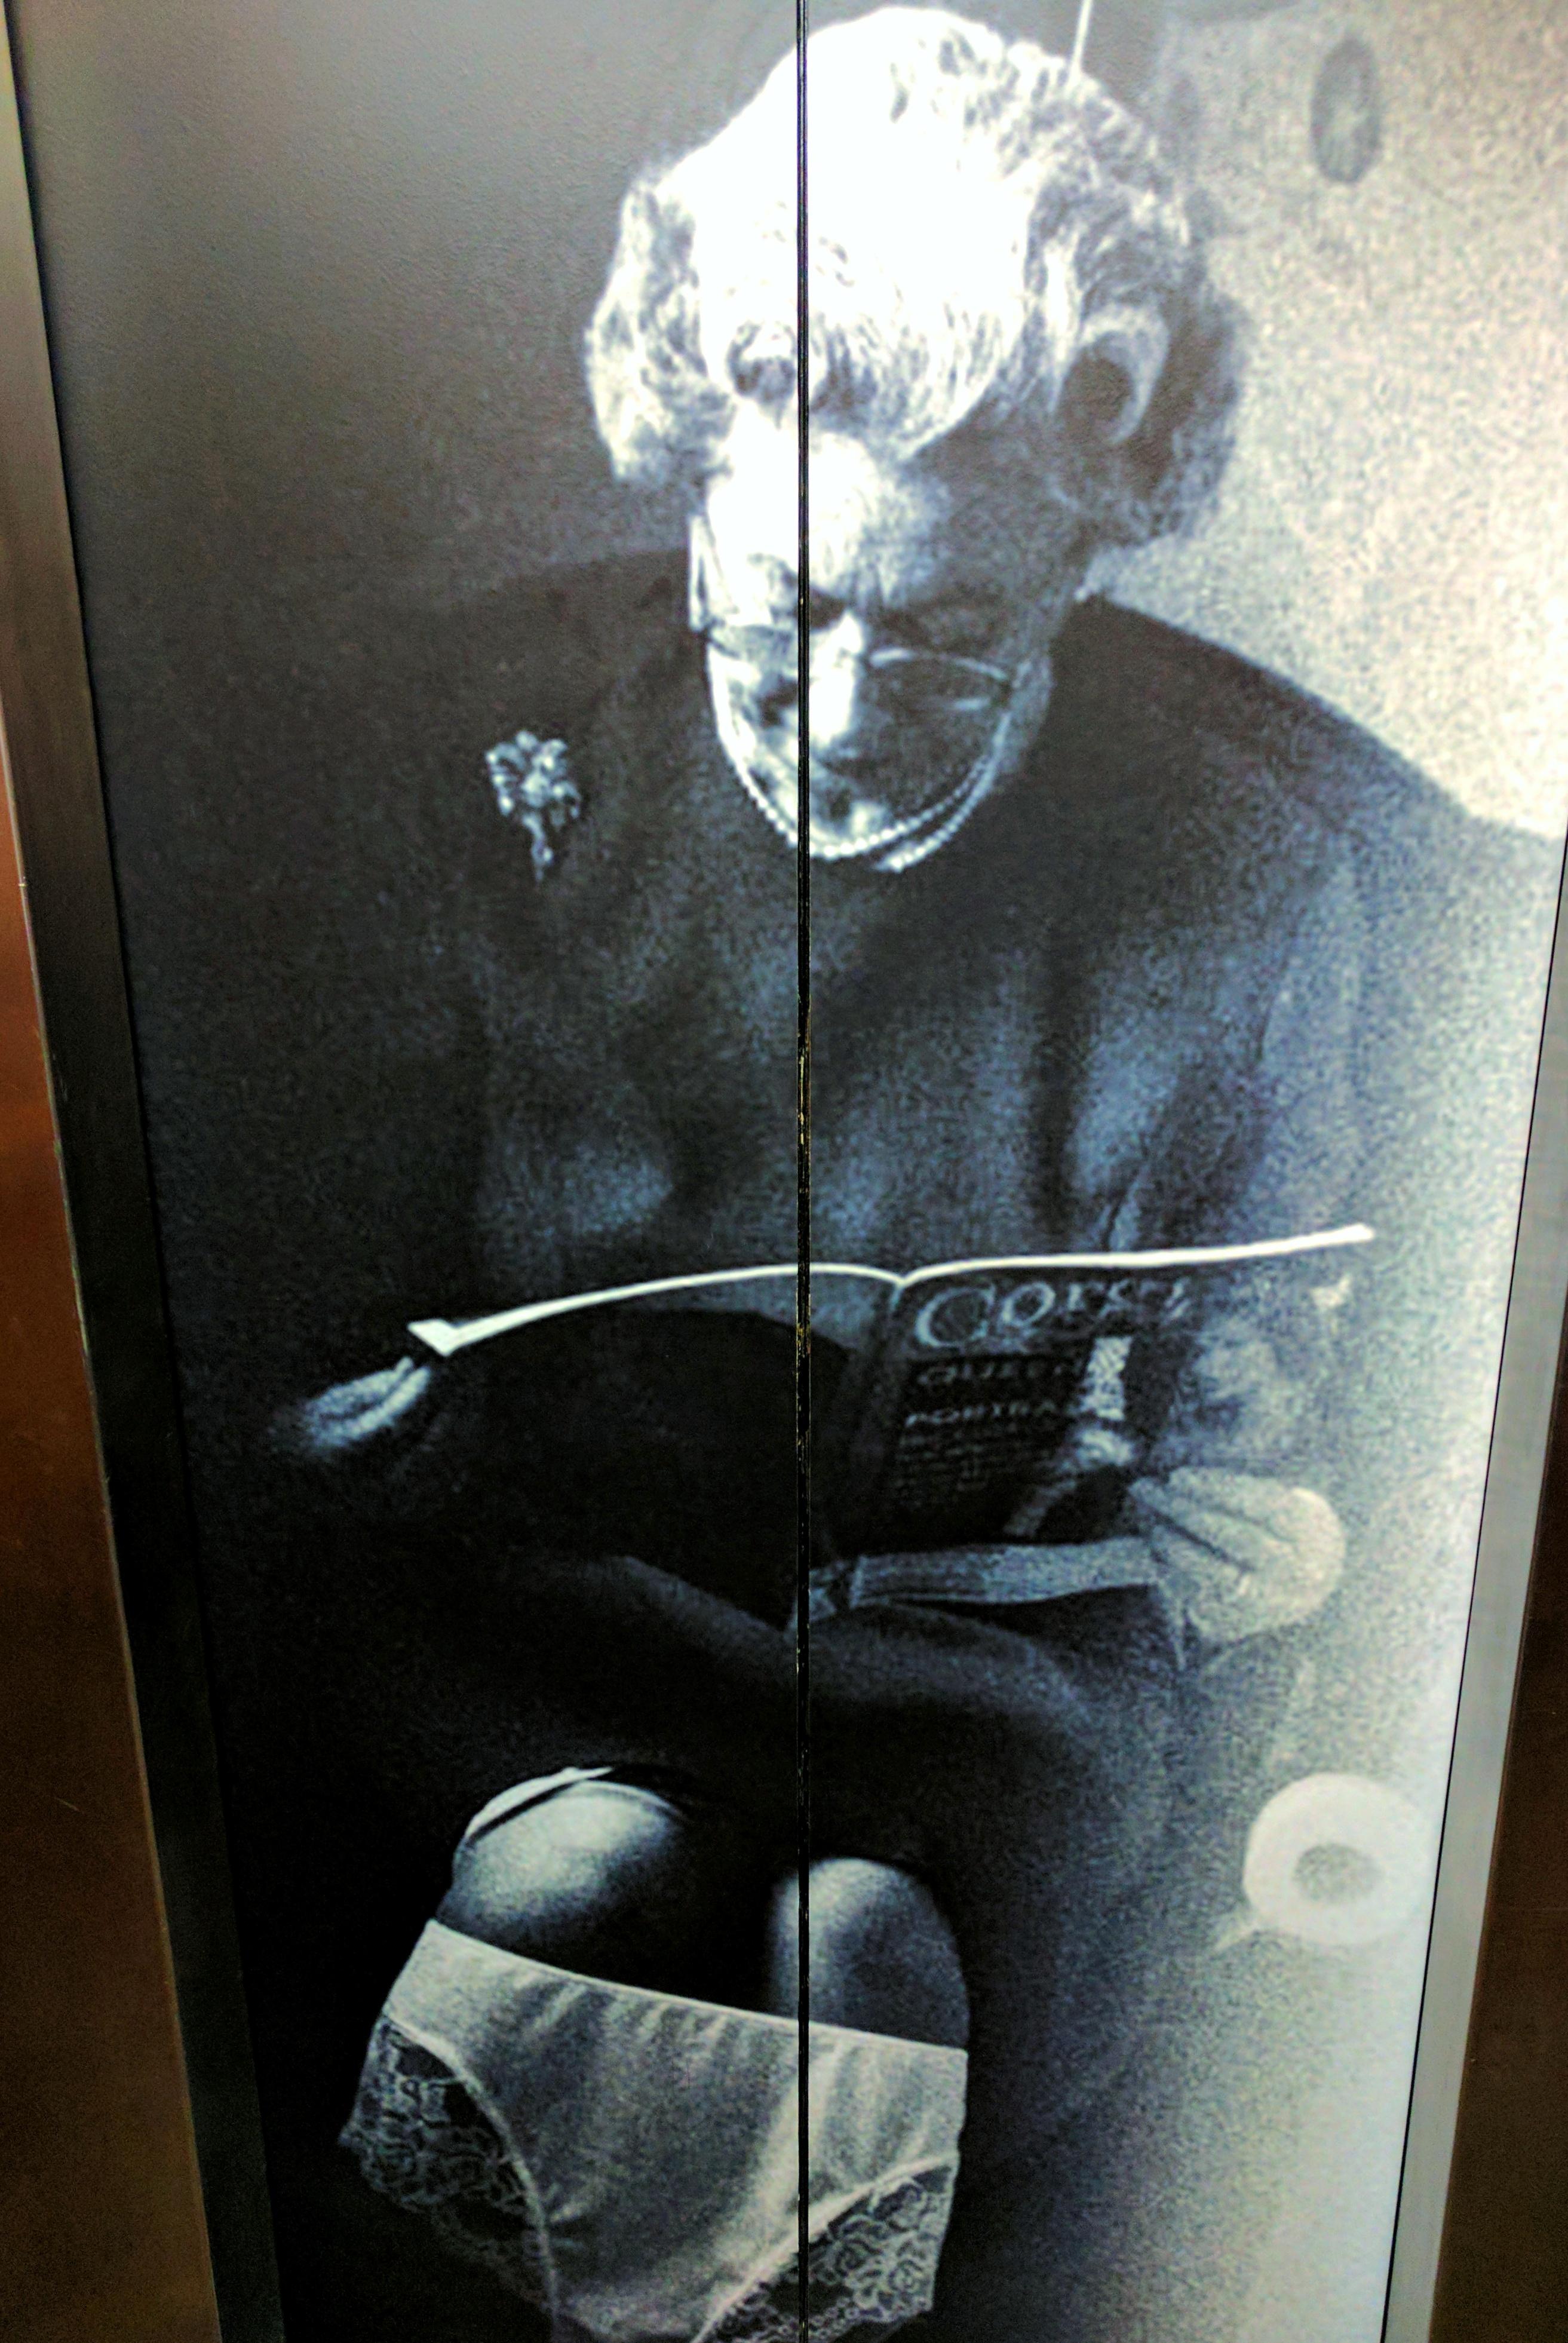 Comedy poster of Queen Elizabeth II on the toilet